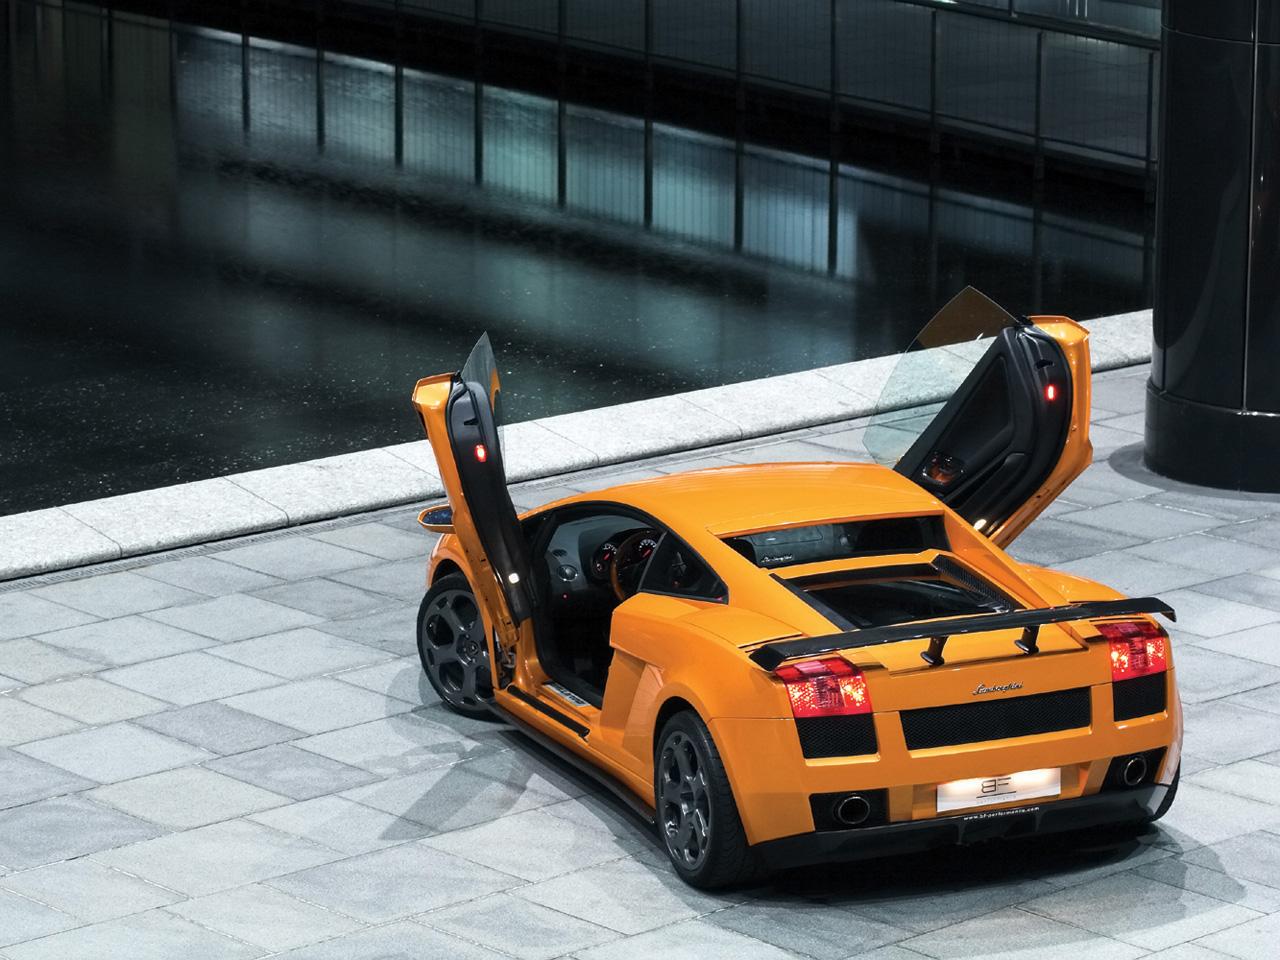 Lamborghini Gallardo Gt Picture 4 Reviews News Specs Buy Car